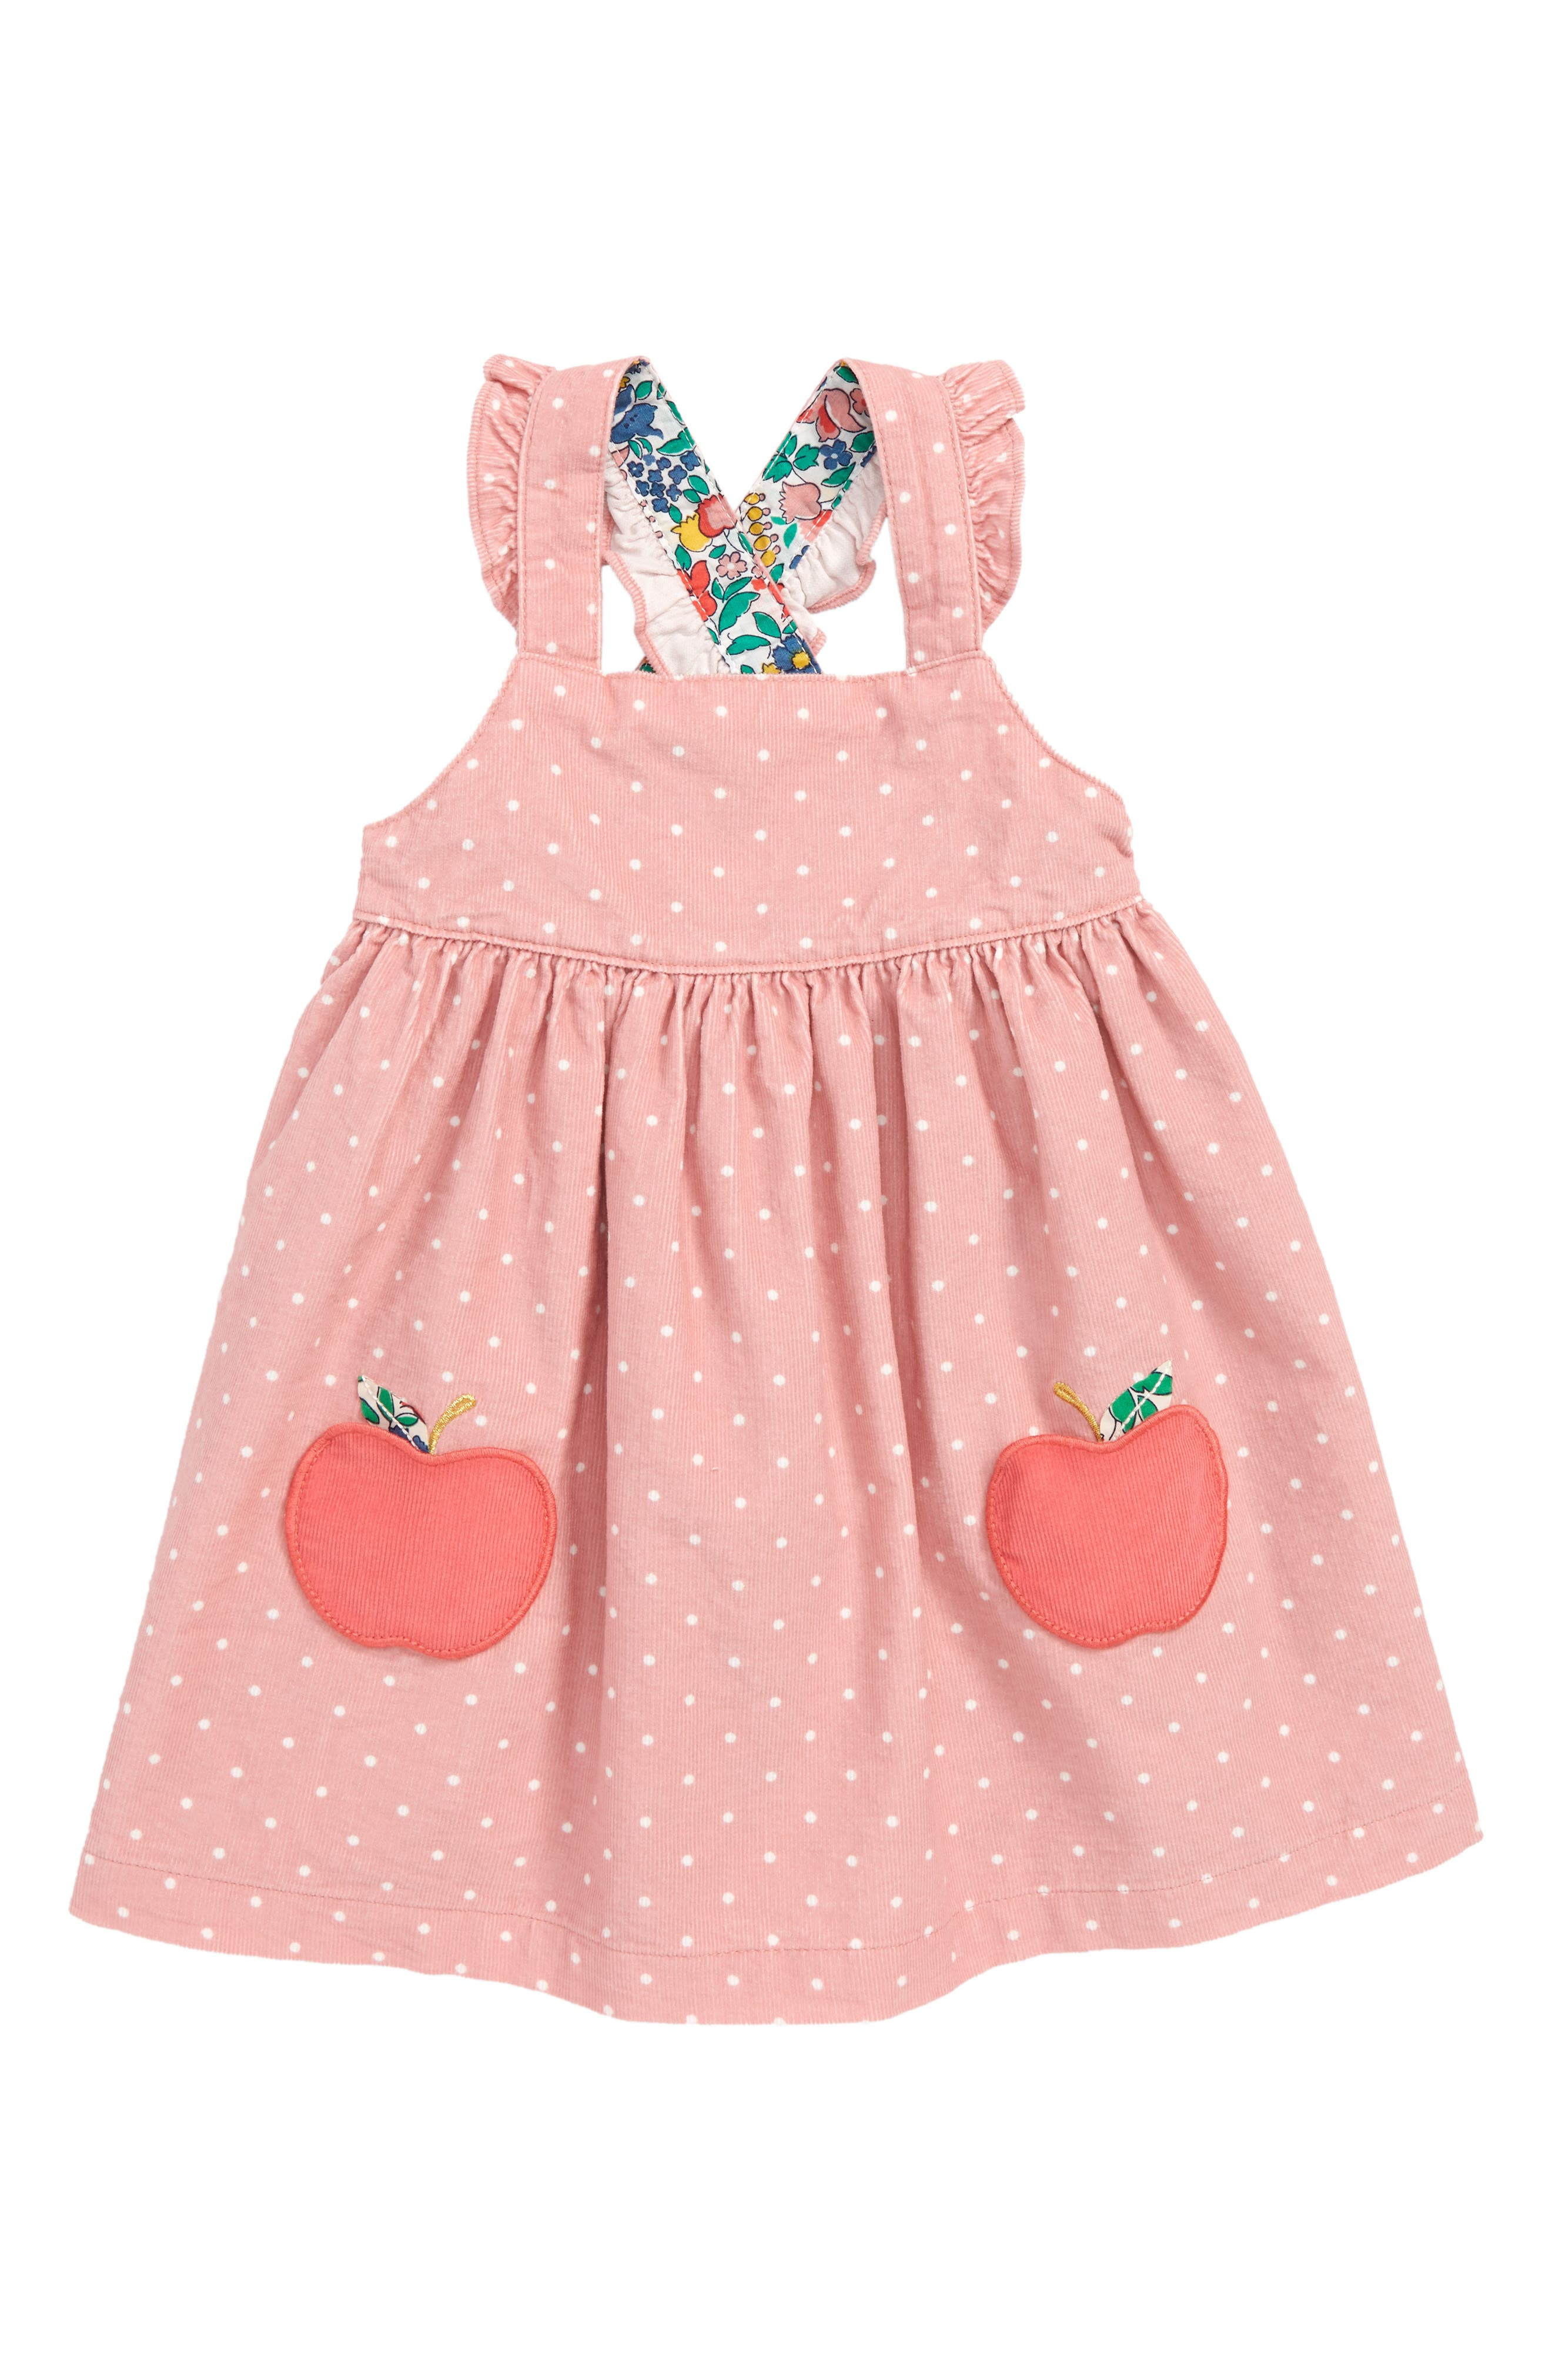 Appliqué Pinafore Dress,                         Main,                         color, ALMOND BLOSSOM/ APPLES